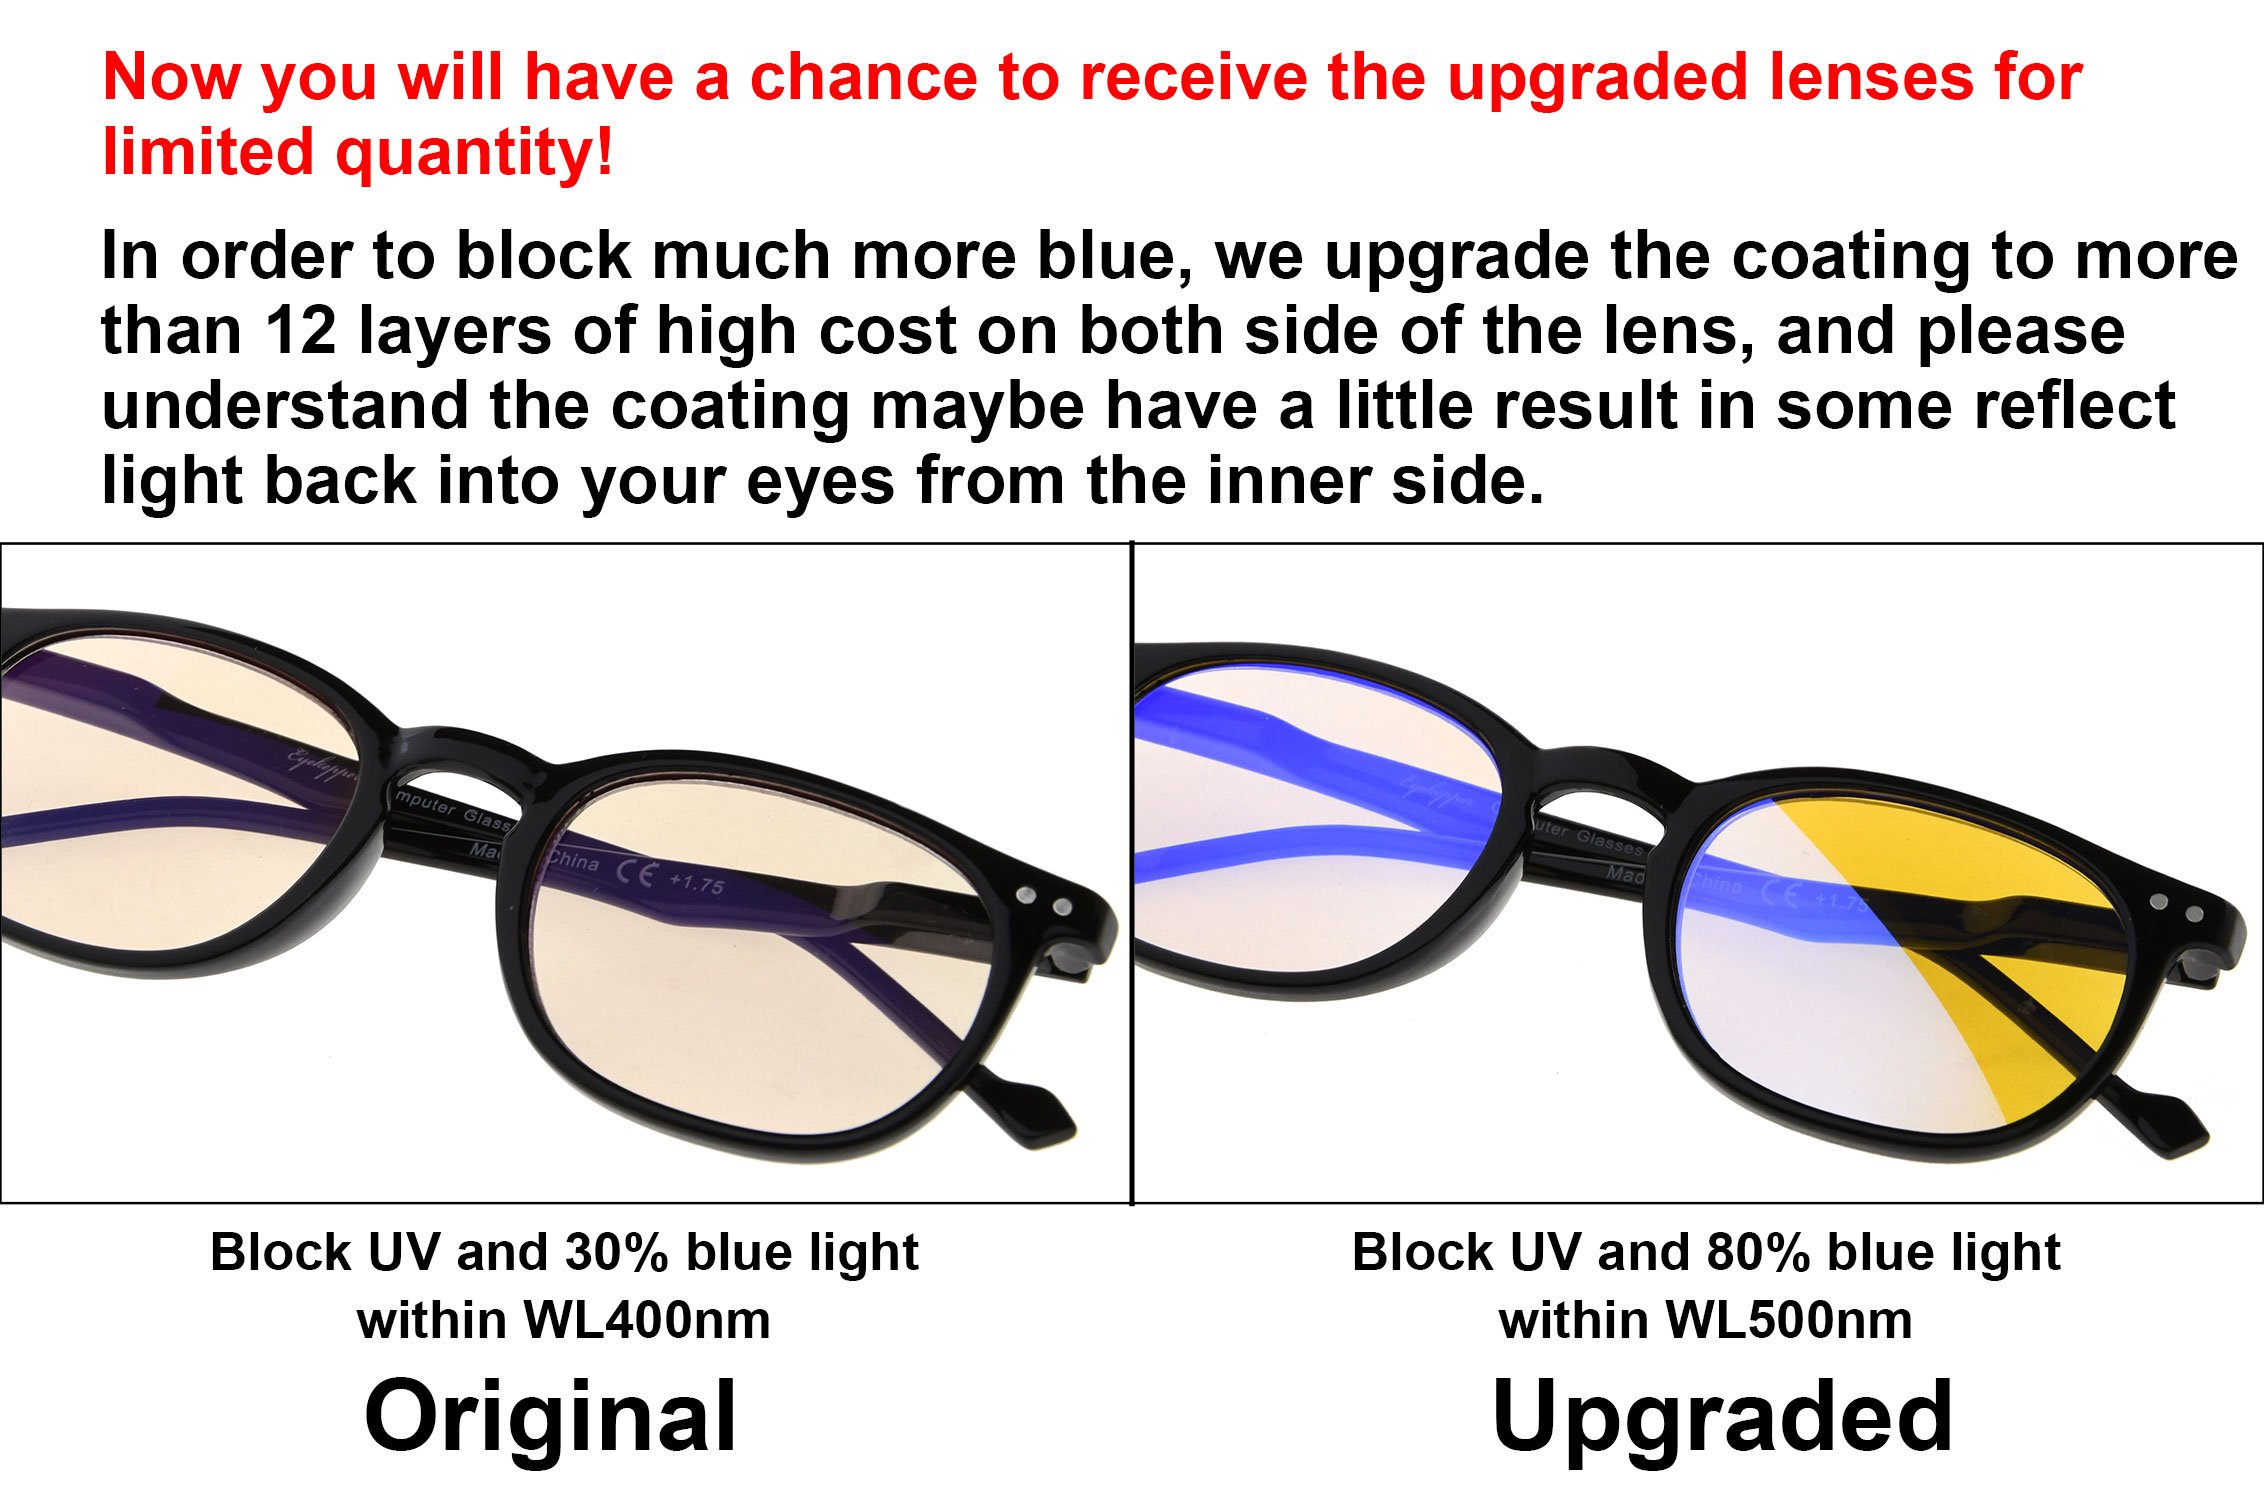 Eyekepper Vintage UV Protection Reading Glasses with Anti reflective Coating 0.50 Strength Readers(Amber Tinted Lens-Transparent) by Eyekepper (Image #4)